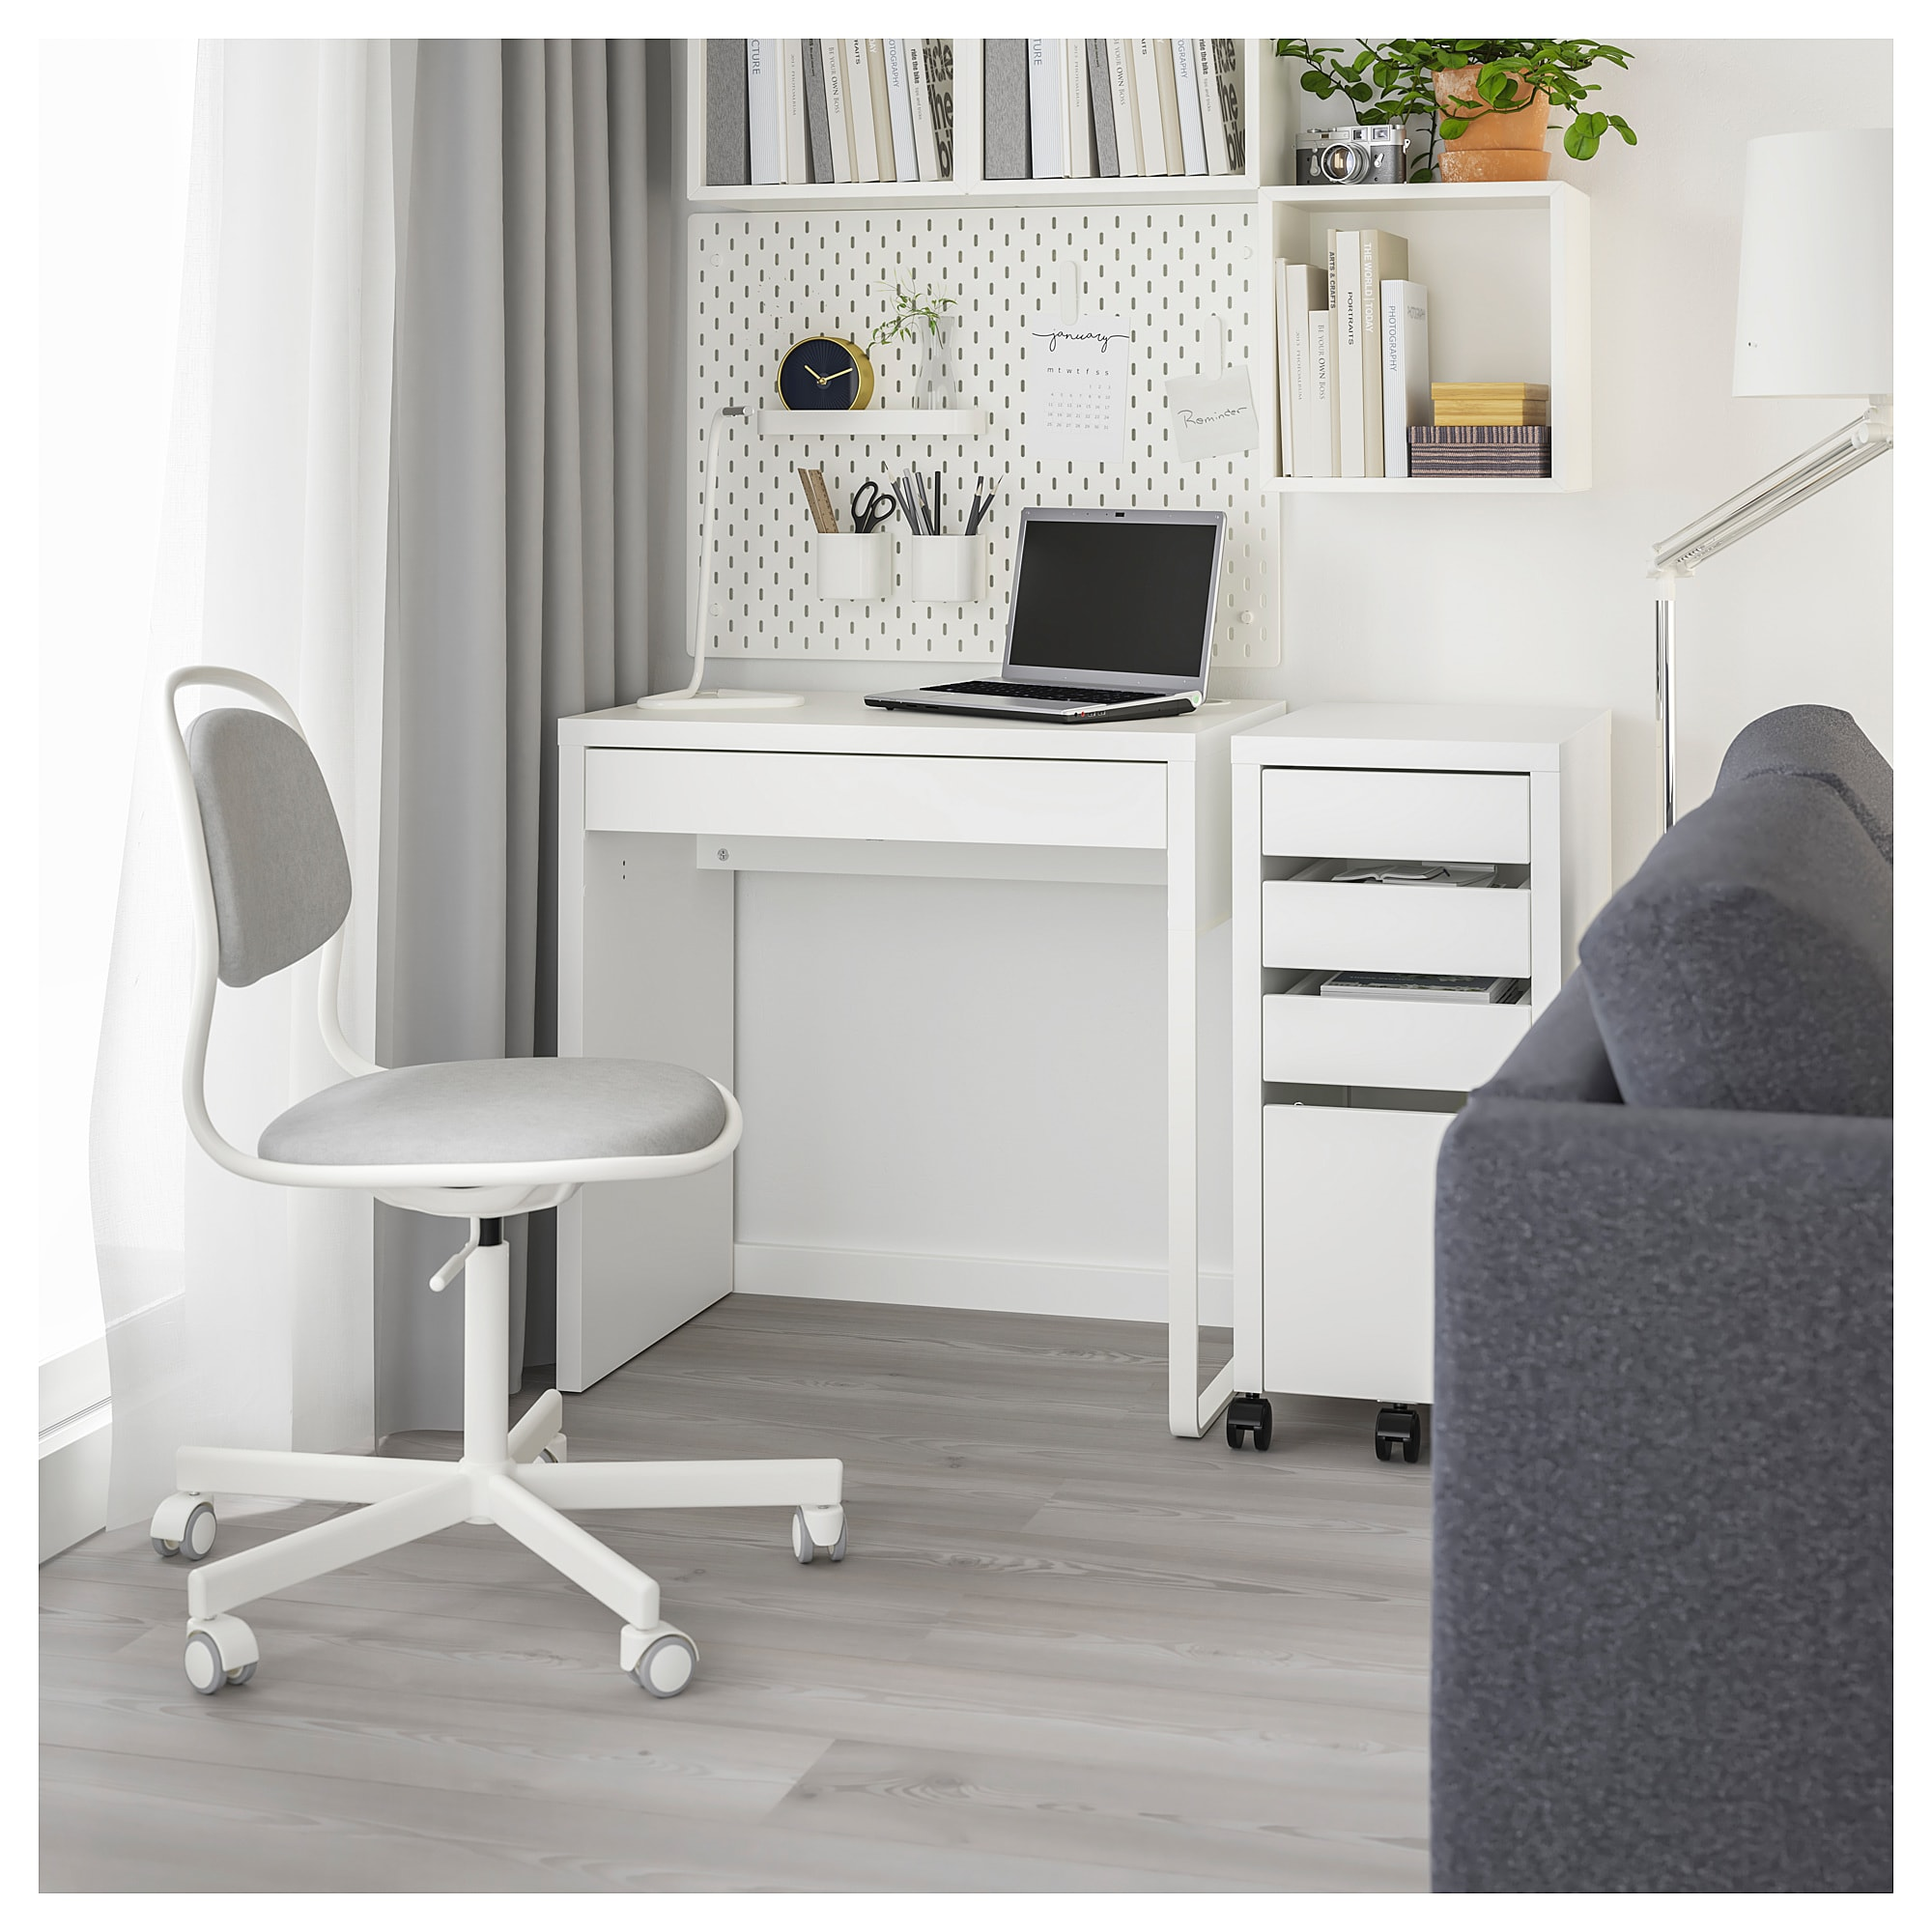 Ikea Micke Desk White Micke Desk Ikea Micke Ikea Micke Desk